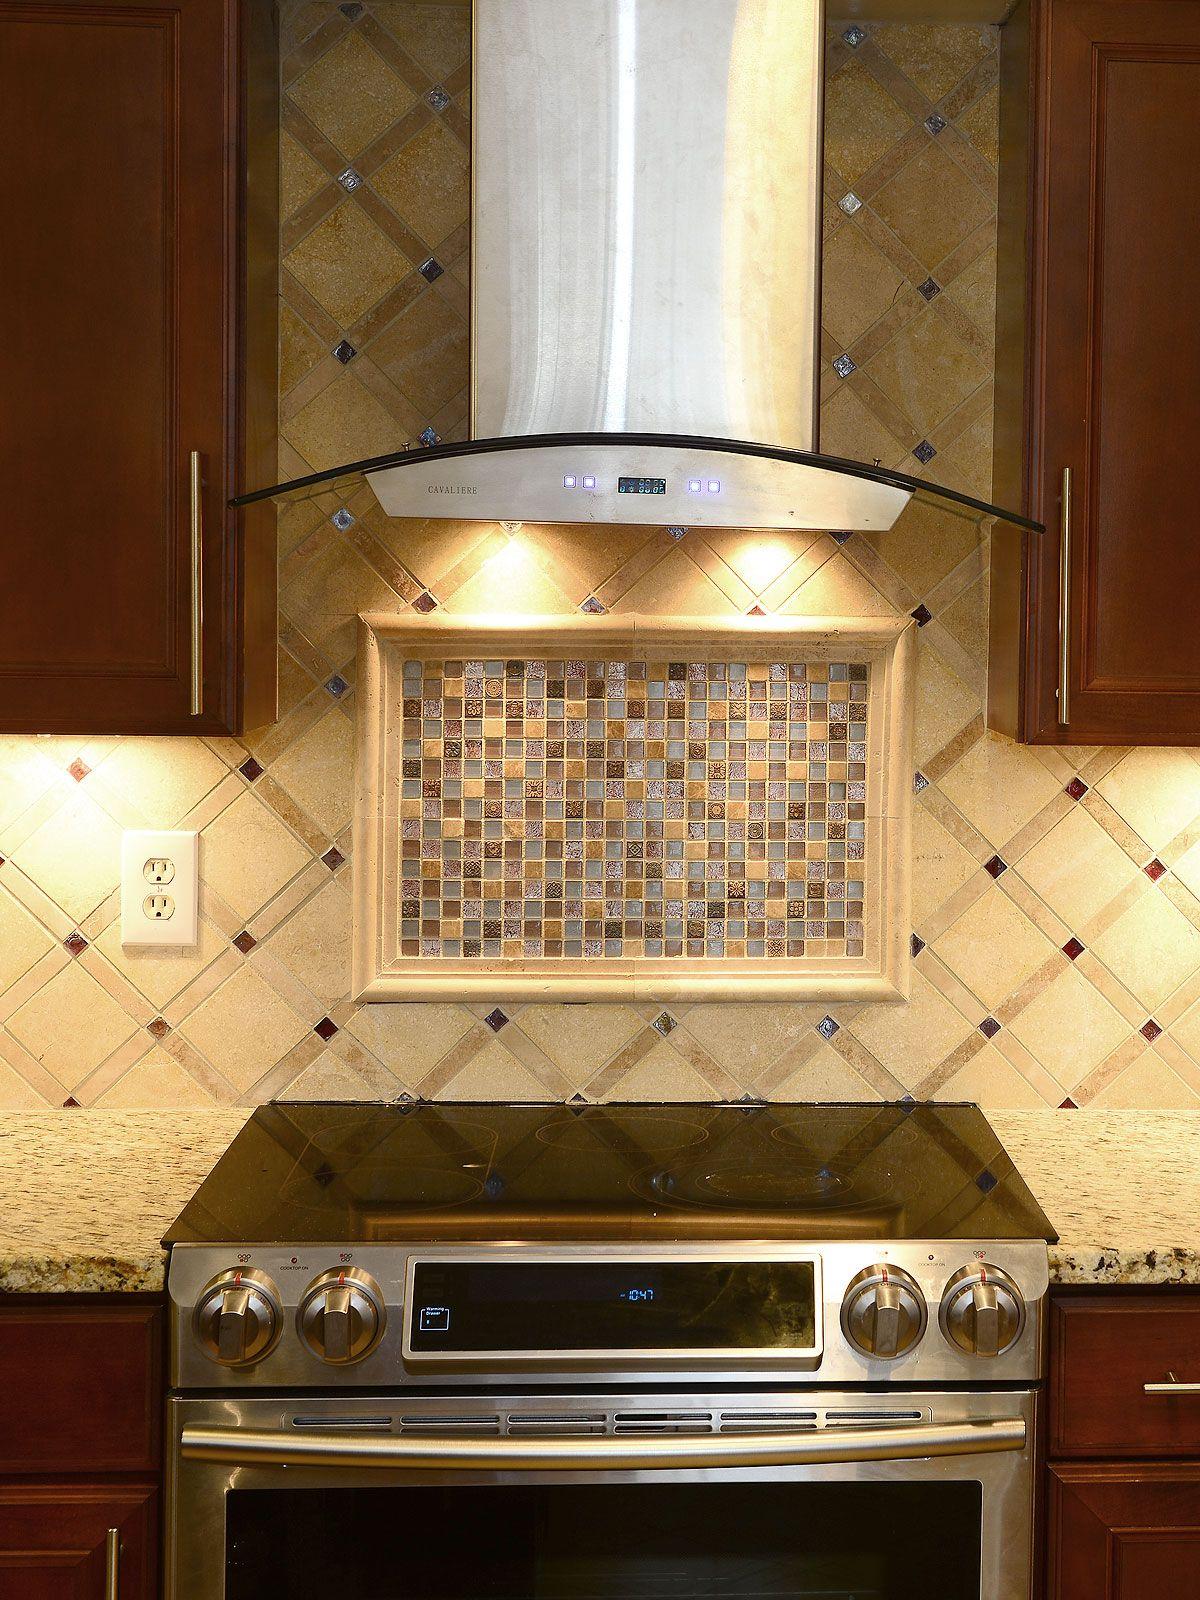 103 Travertine Backsplash Ideas Top Trend Tile Designs Travertine Backsplash Travertine Tile Backsplash Kitchen Backsplash Designs